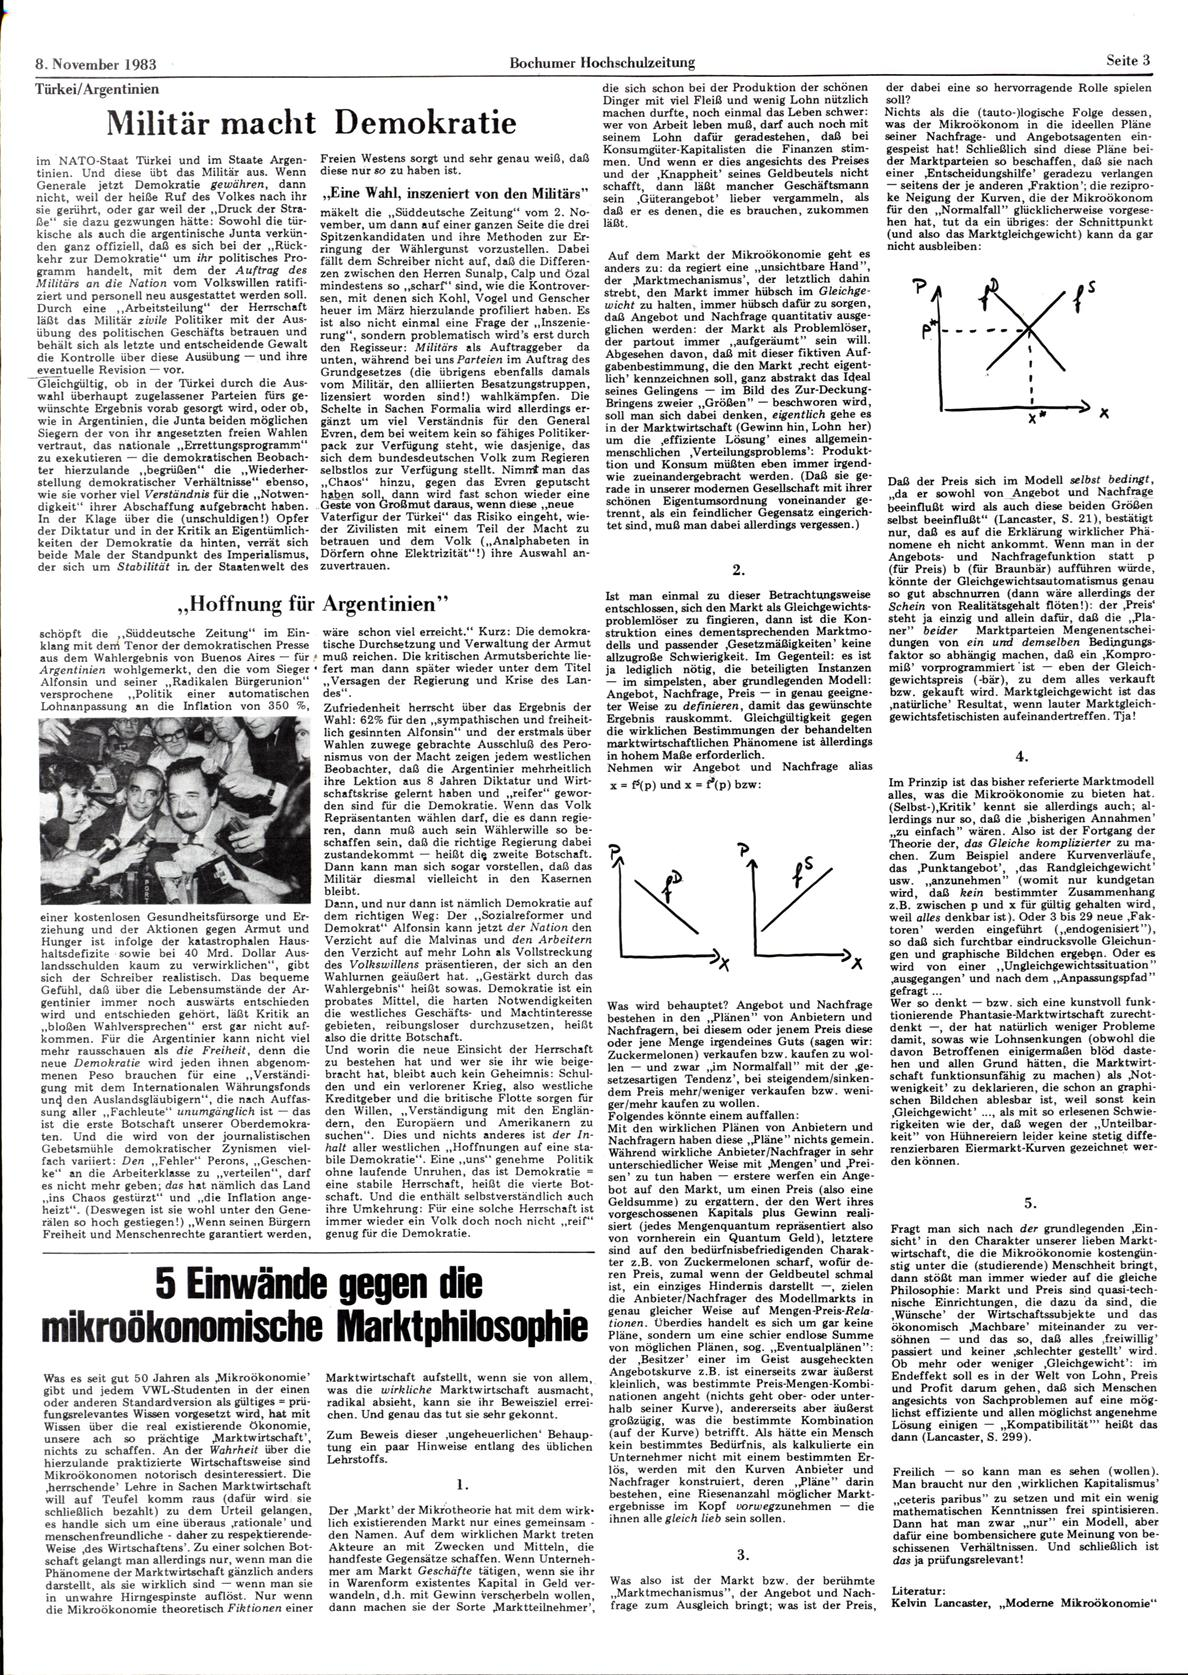 Bochum_BHZ_19831108_079_003